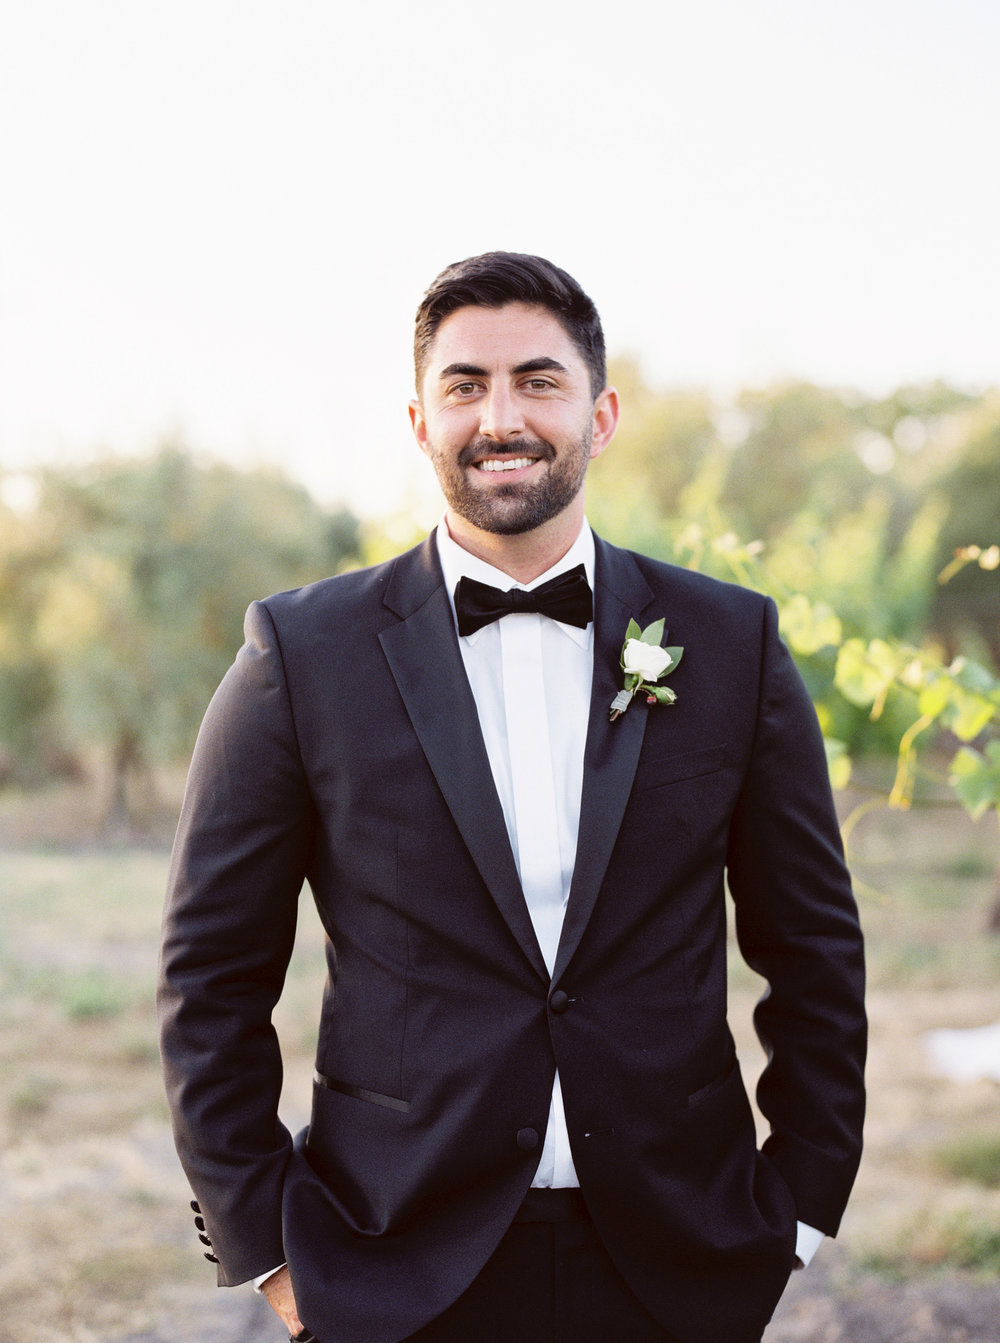 vintners-inn-wedding-in-santa-rosa-california-128.jpg